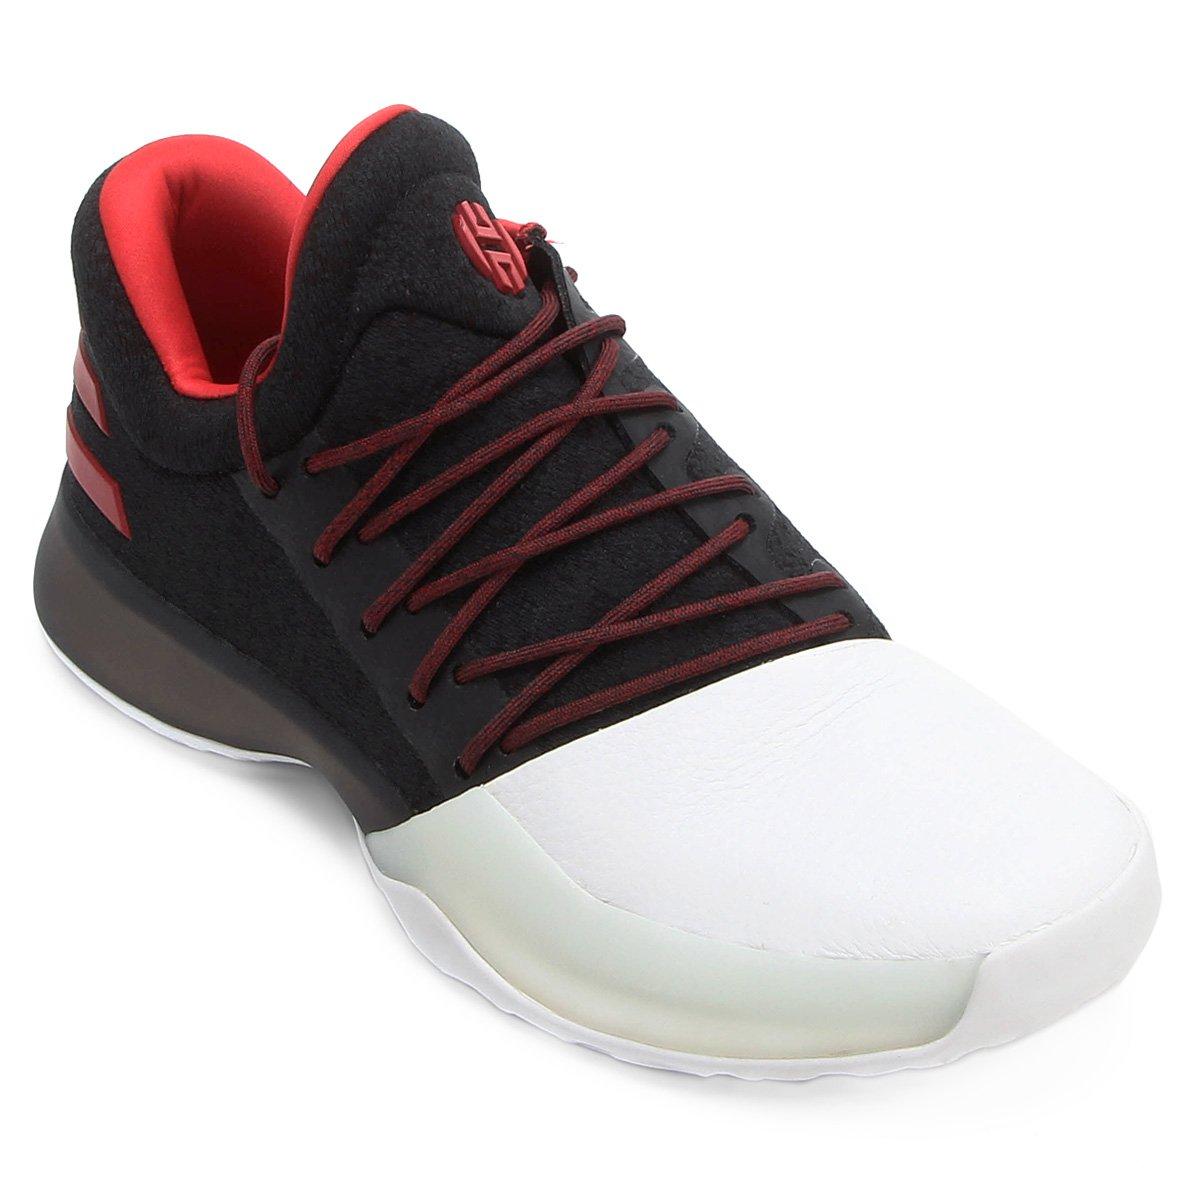 43e14a7199 Tênis Adidas James Harden Crazy X Masculino - Compre Agora